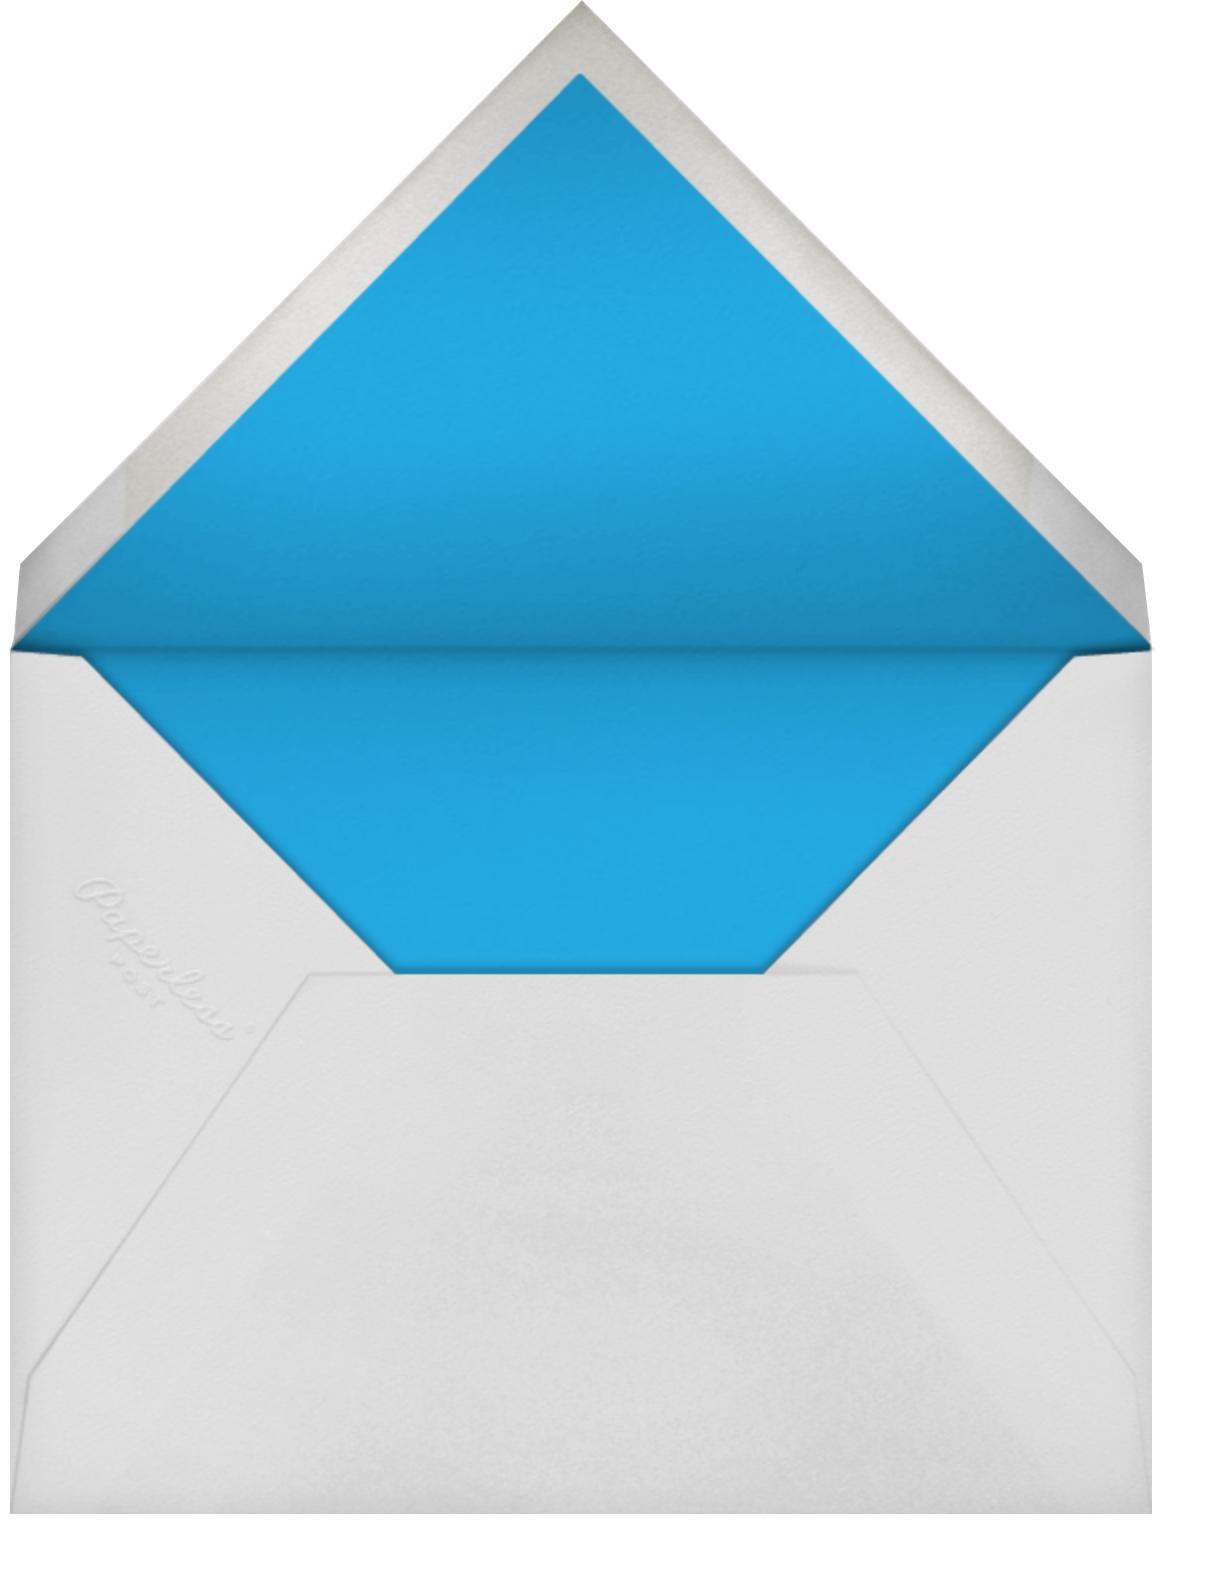 Diwali in Bloom (Invitation) - Paperless Post - Diwali - envelope back